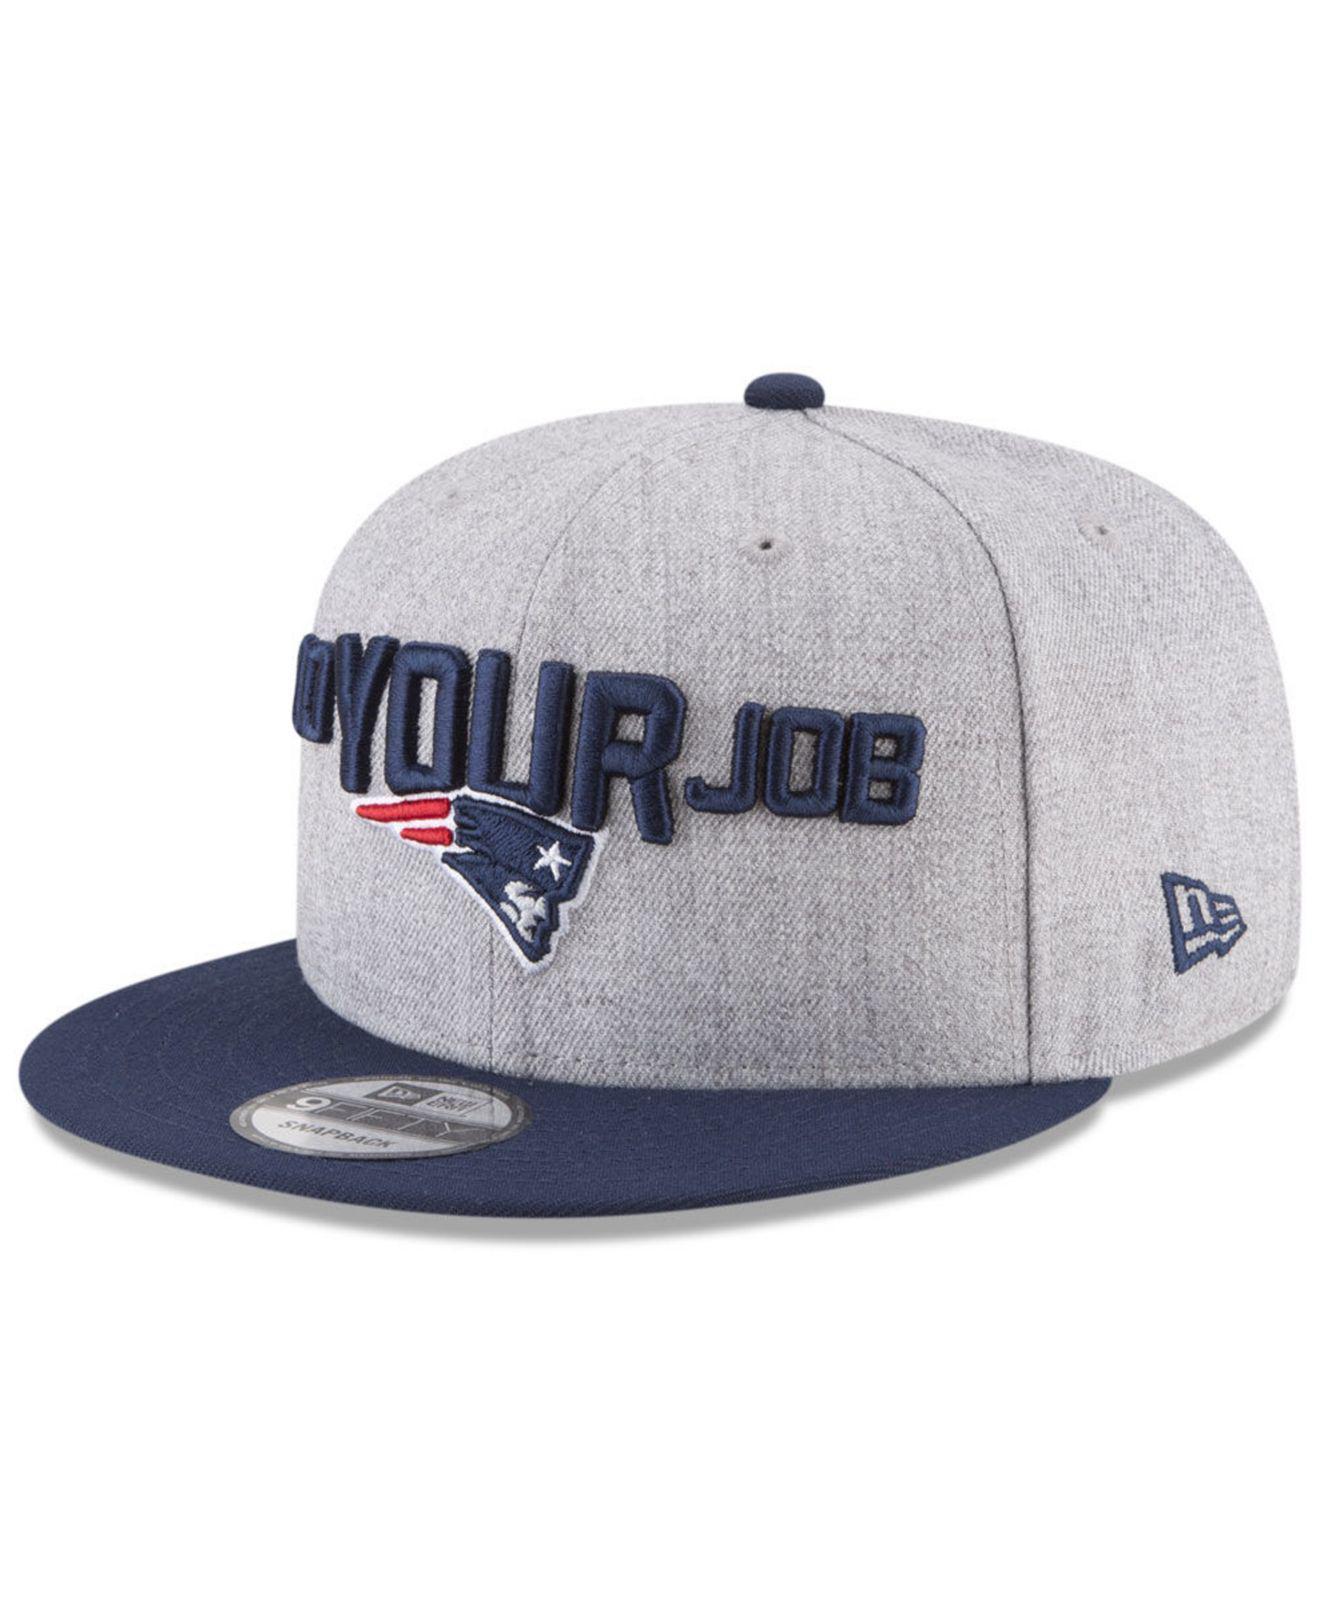 ca9fadc49e7 Lyst - Ktz New England Patriots Draft 9fifty Snapback Cap in Blue ...